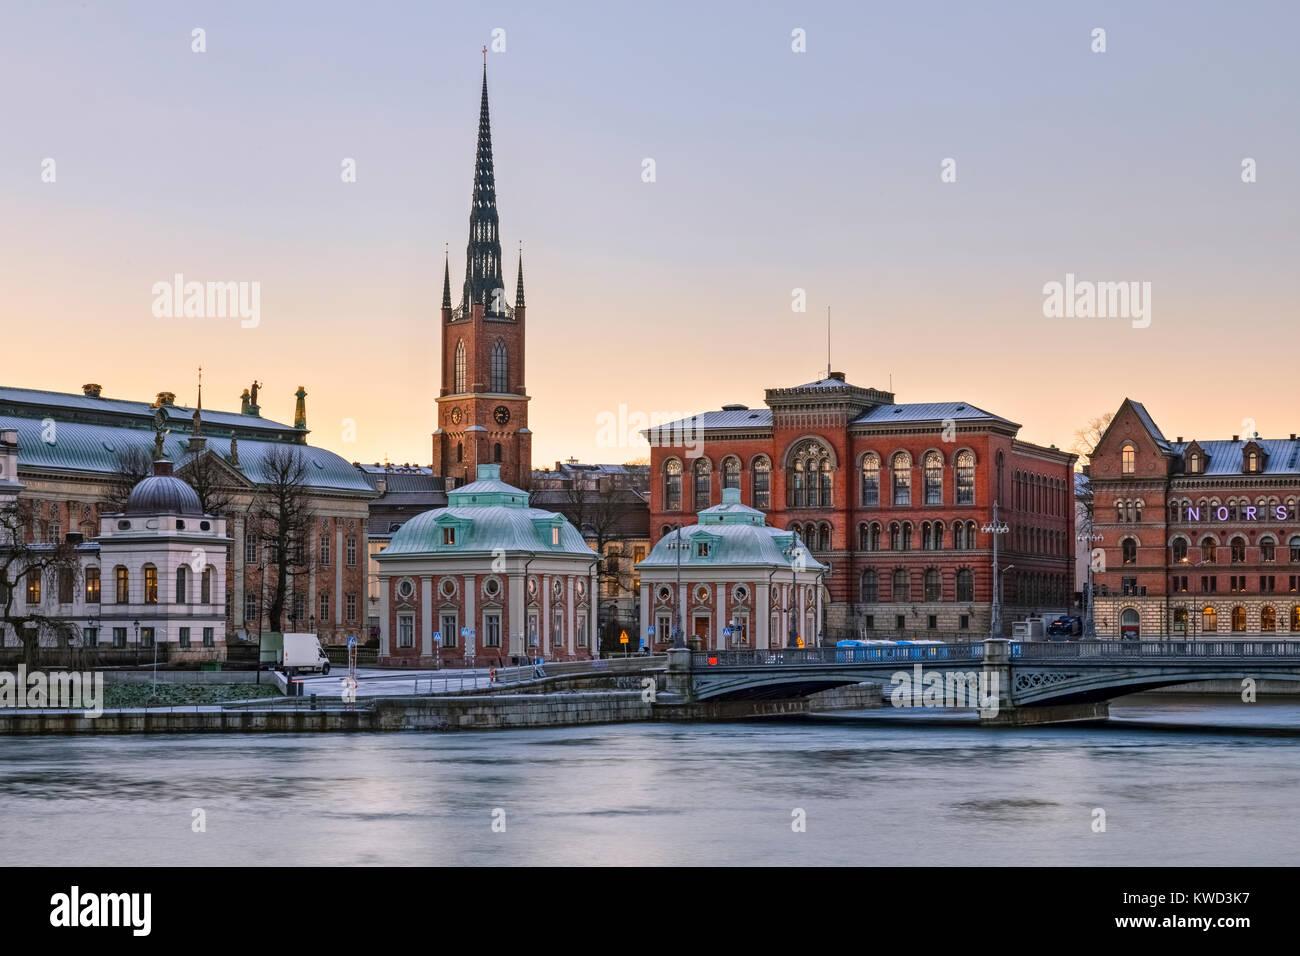 Gamla Stan, Stockholm, Sweden, Europe - Stock Image